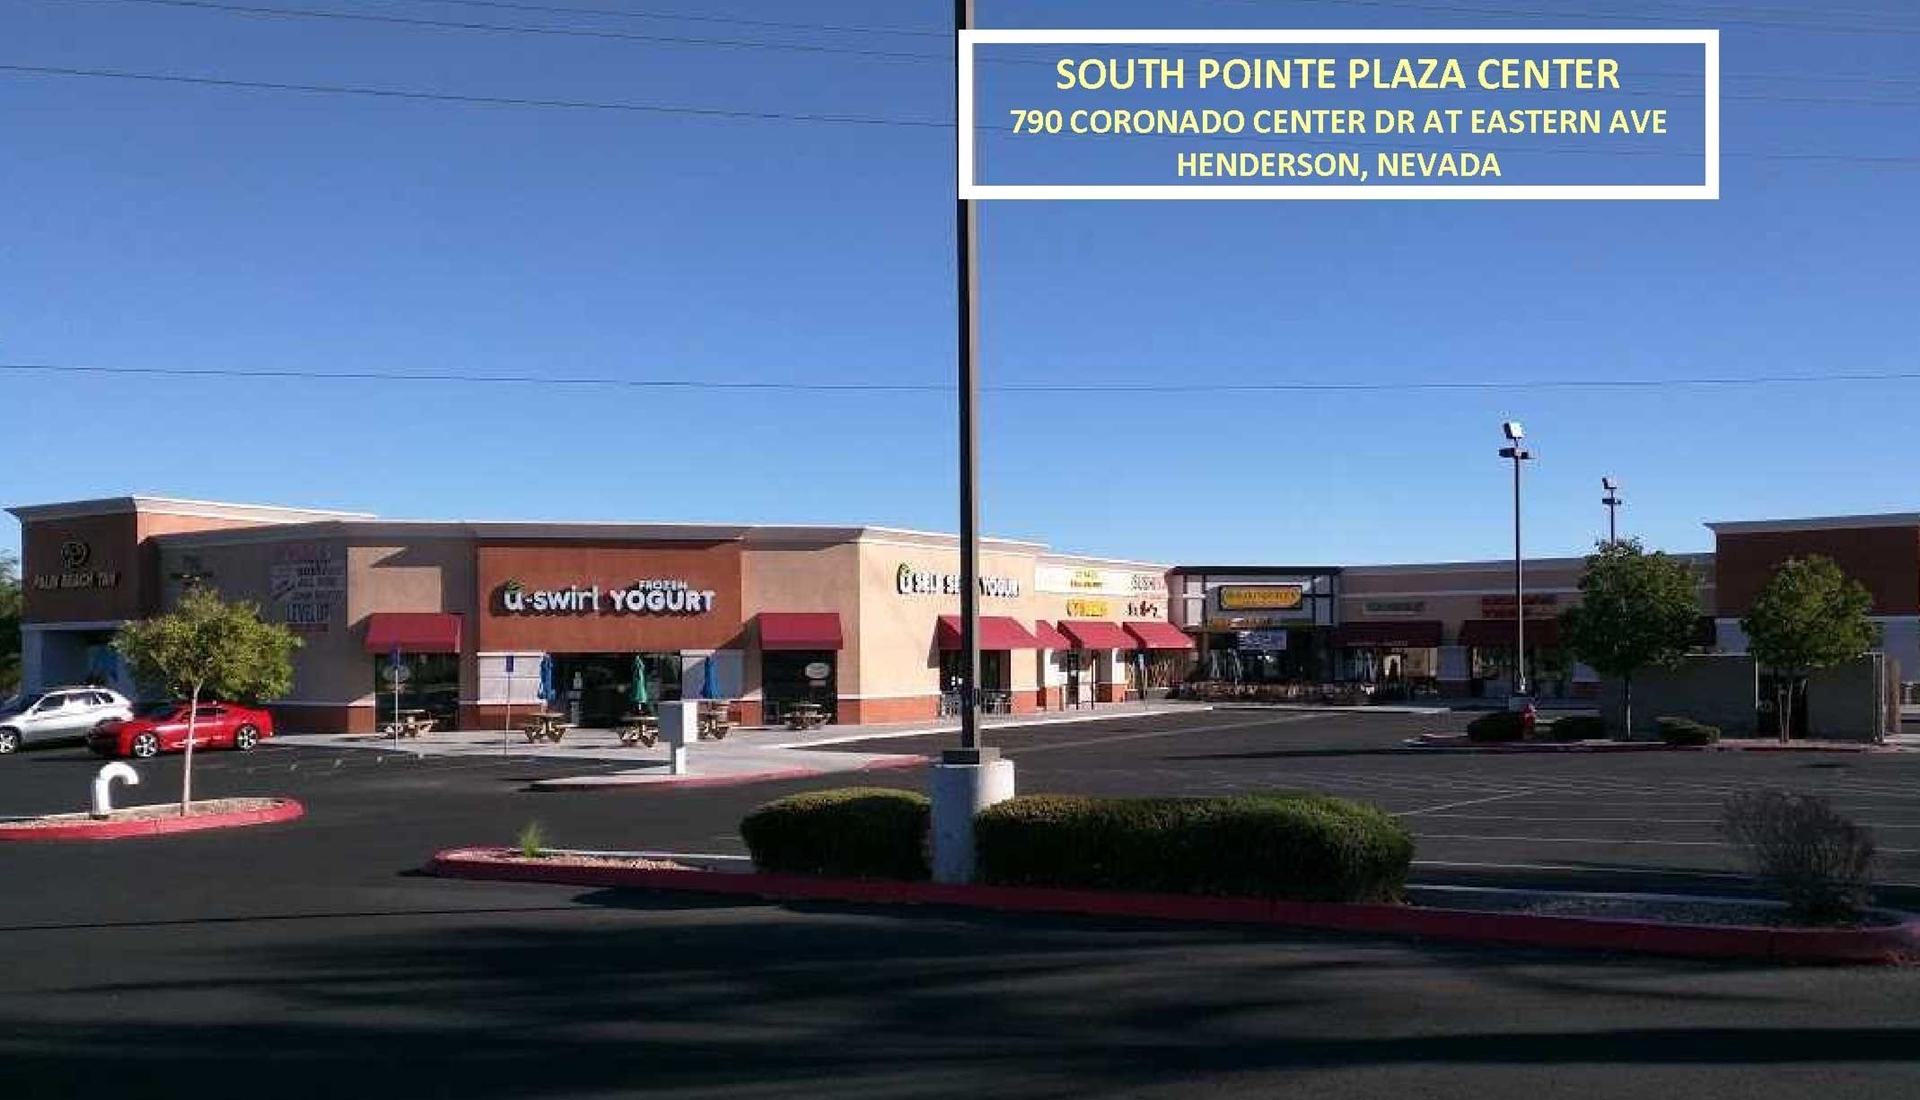 S Pointe Plaza 3